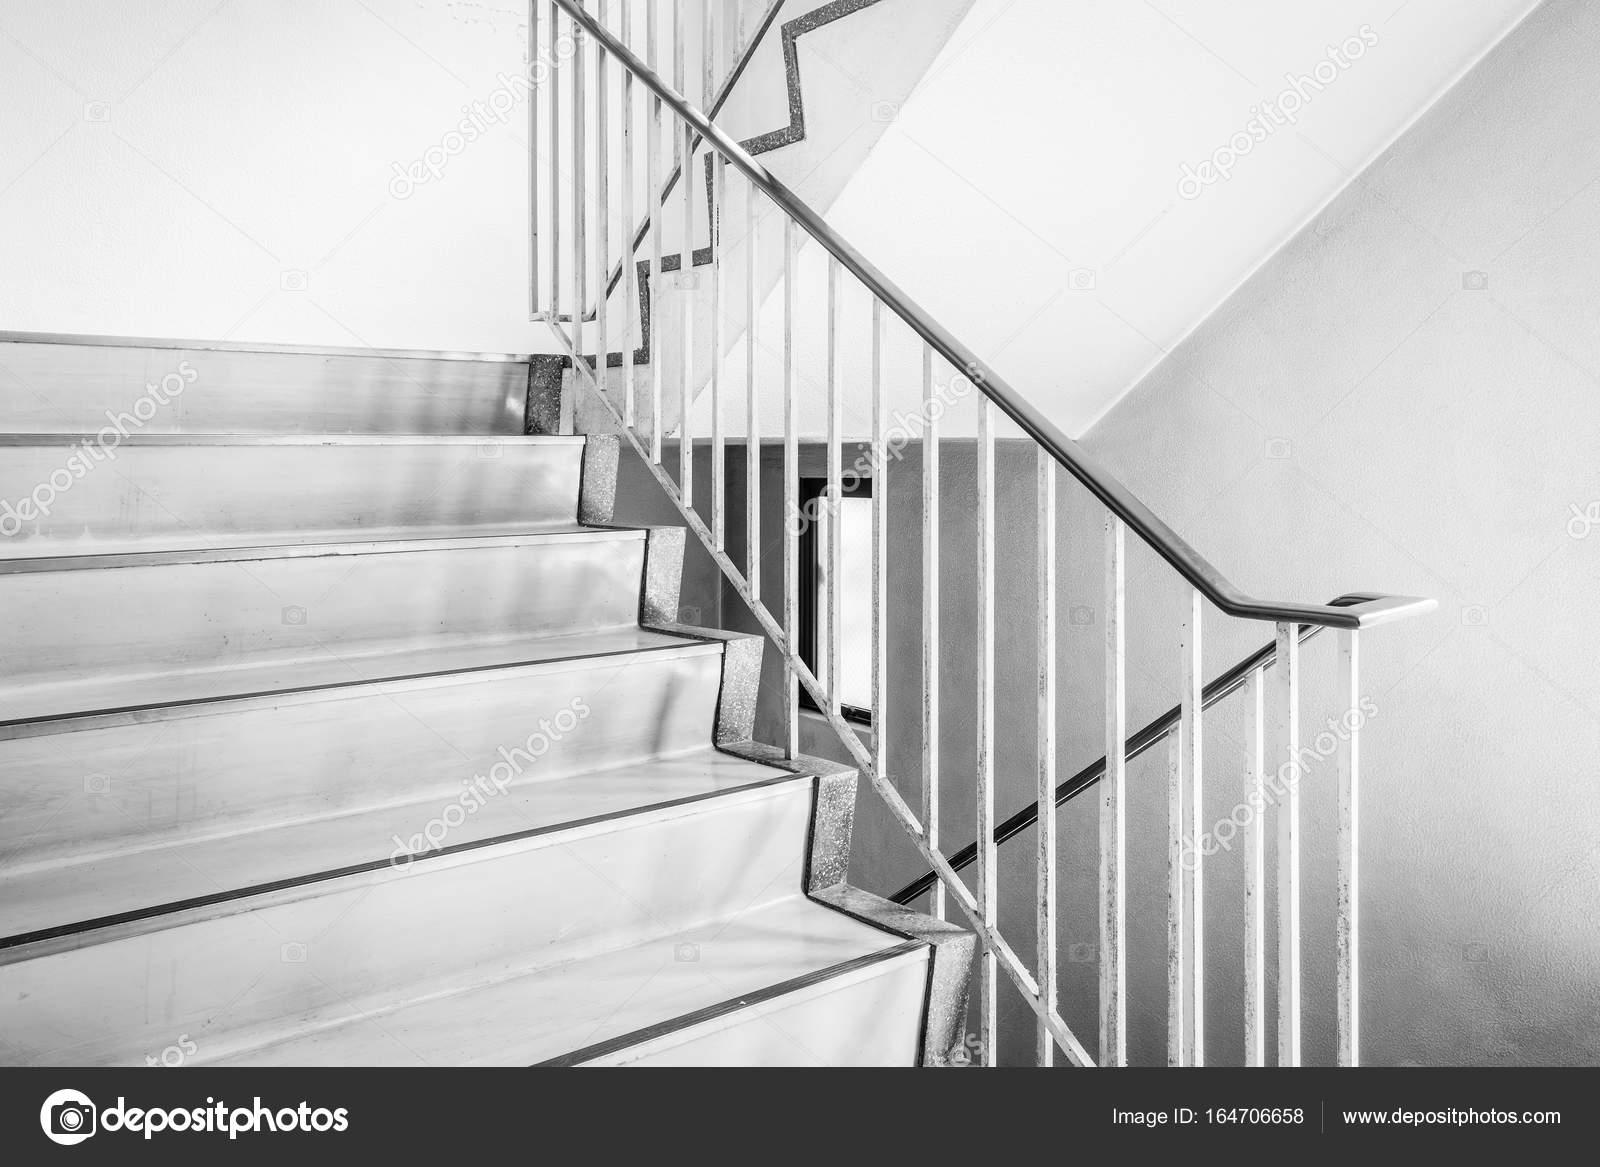 Betonnen trap met metalen leuning u2014 stockfoto © torsakarin #164706658